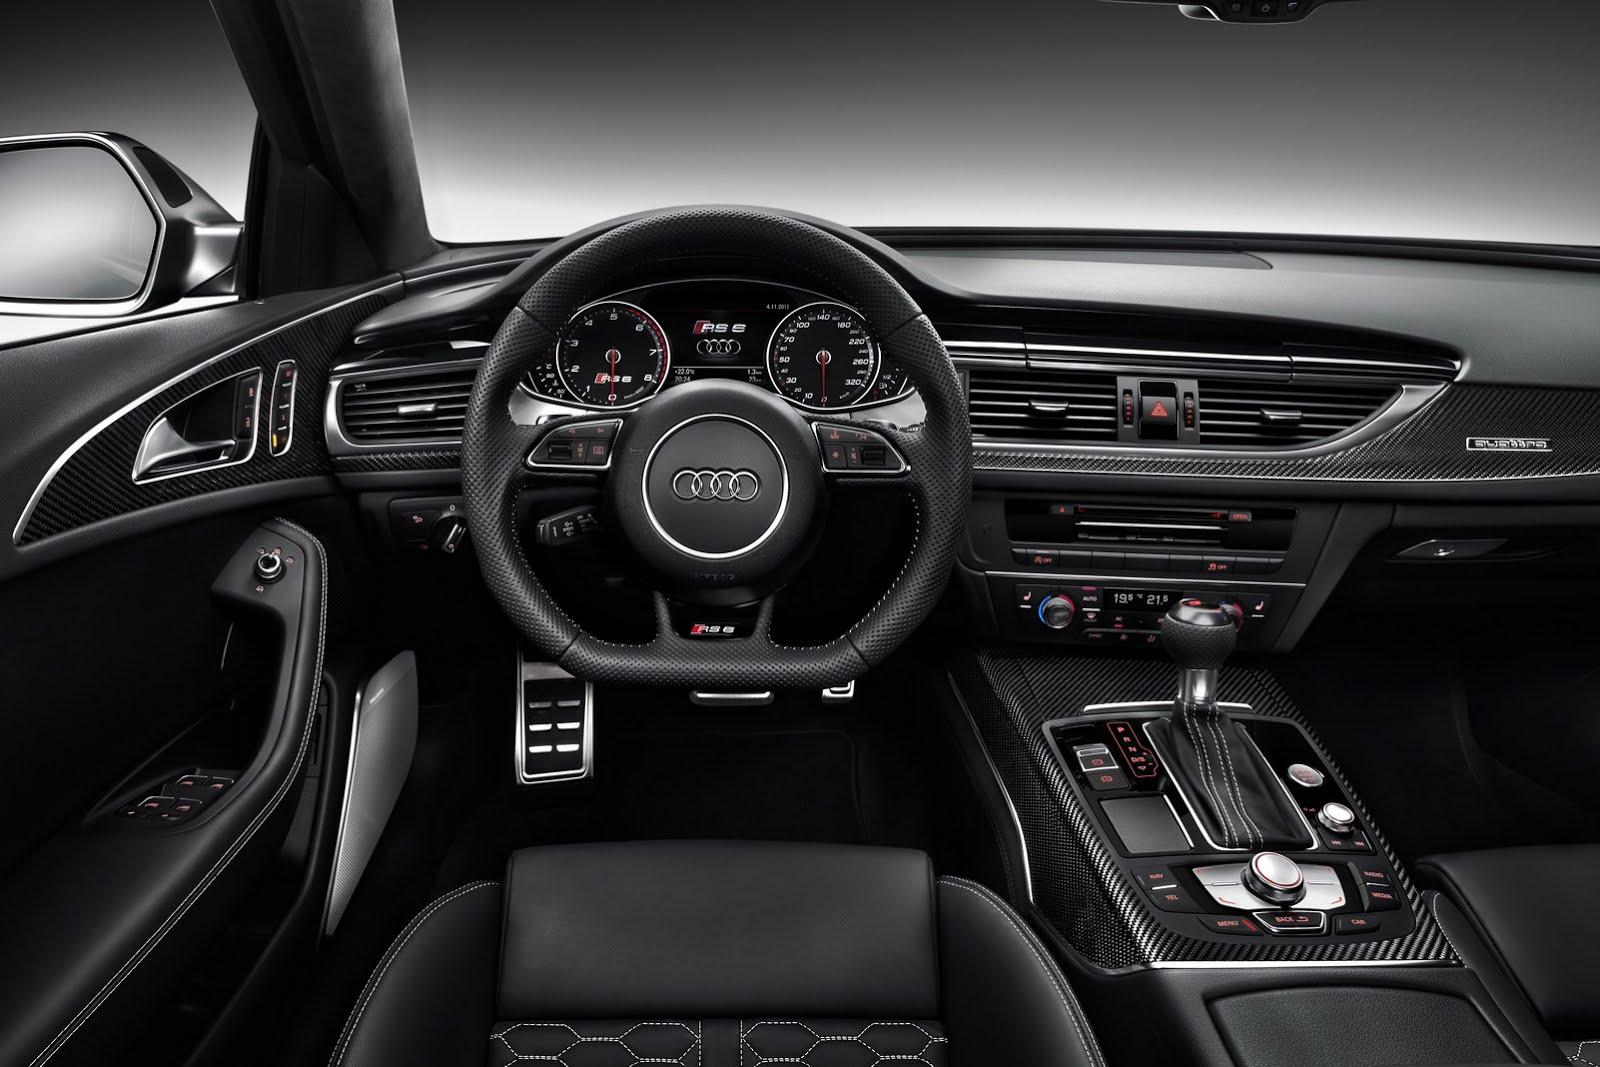 http://4.bp.blogspot.com/-m2eWobI_FVE/UZQ-FpNtnKI/AAAAAAAABtk/T-Y2JITuW0k/s1600/2014-Audi-RS6-Avant-17.jpg